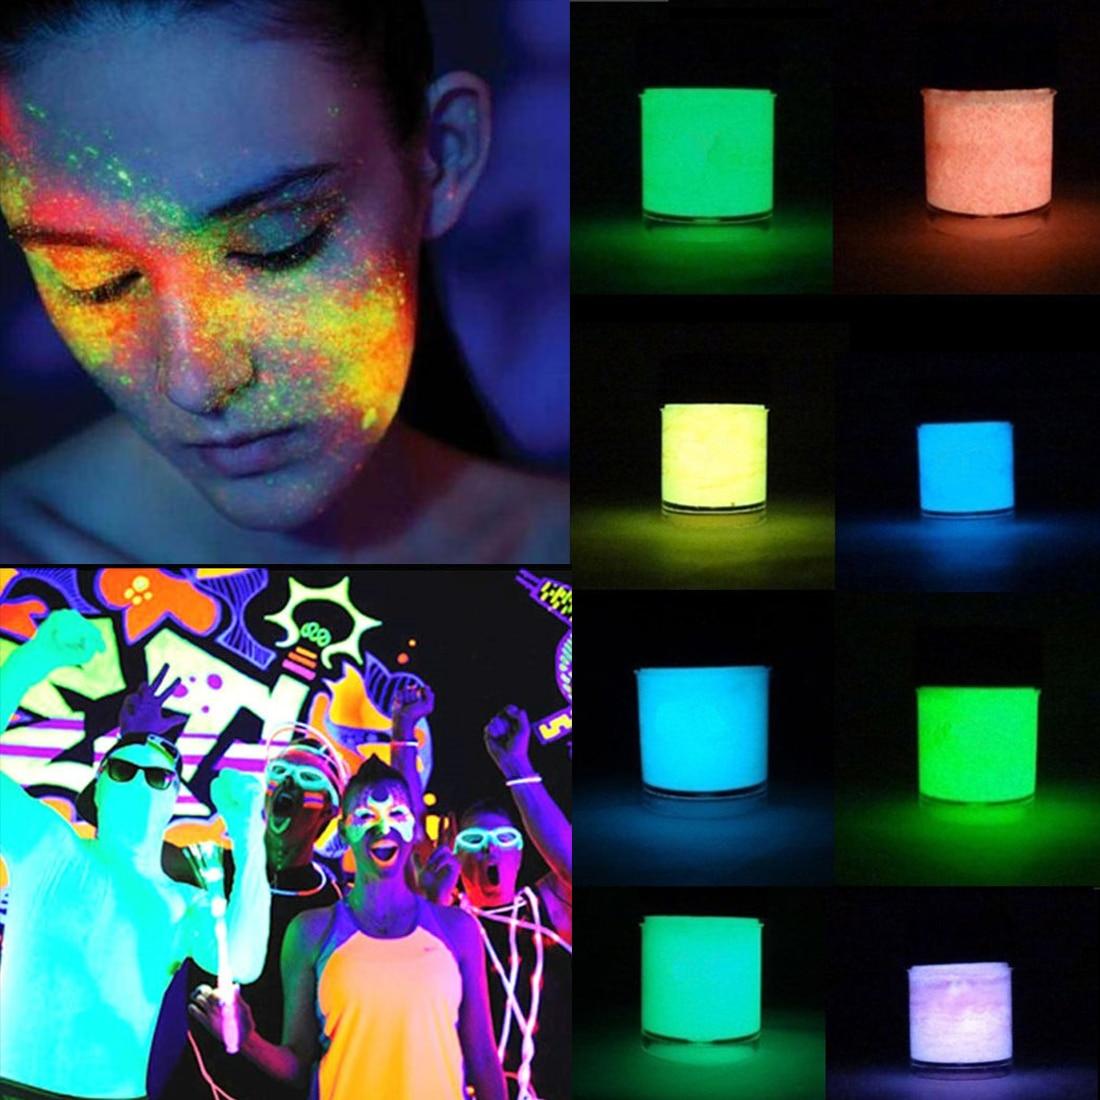 Pintura acrílica no tóxica, sin olores, luminosa, pigmento fluorescente para arte corporal, fiesta nocturna, brillo, pintura de grafiti